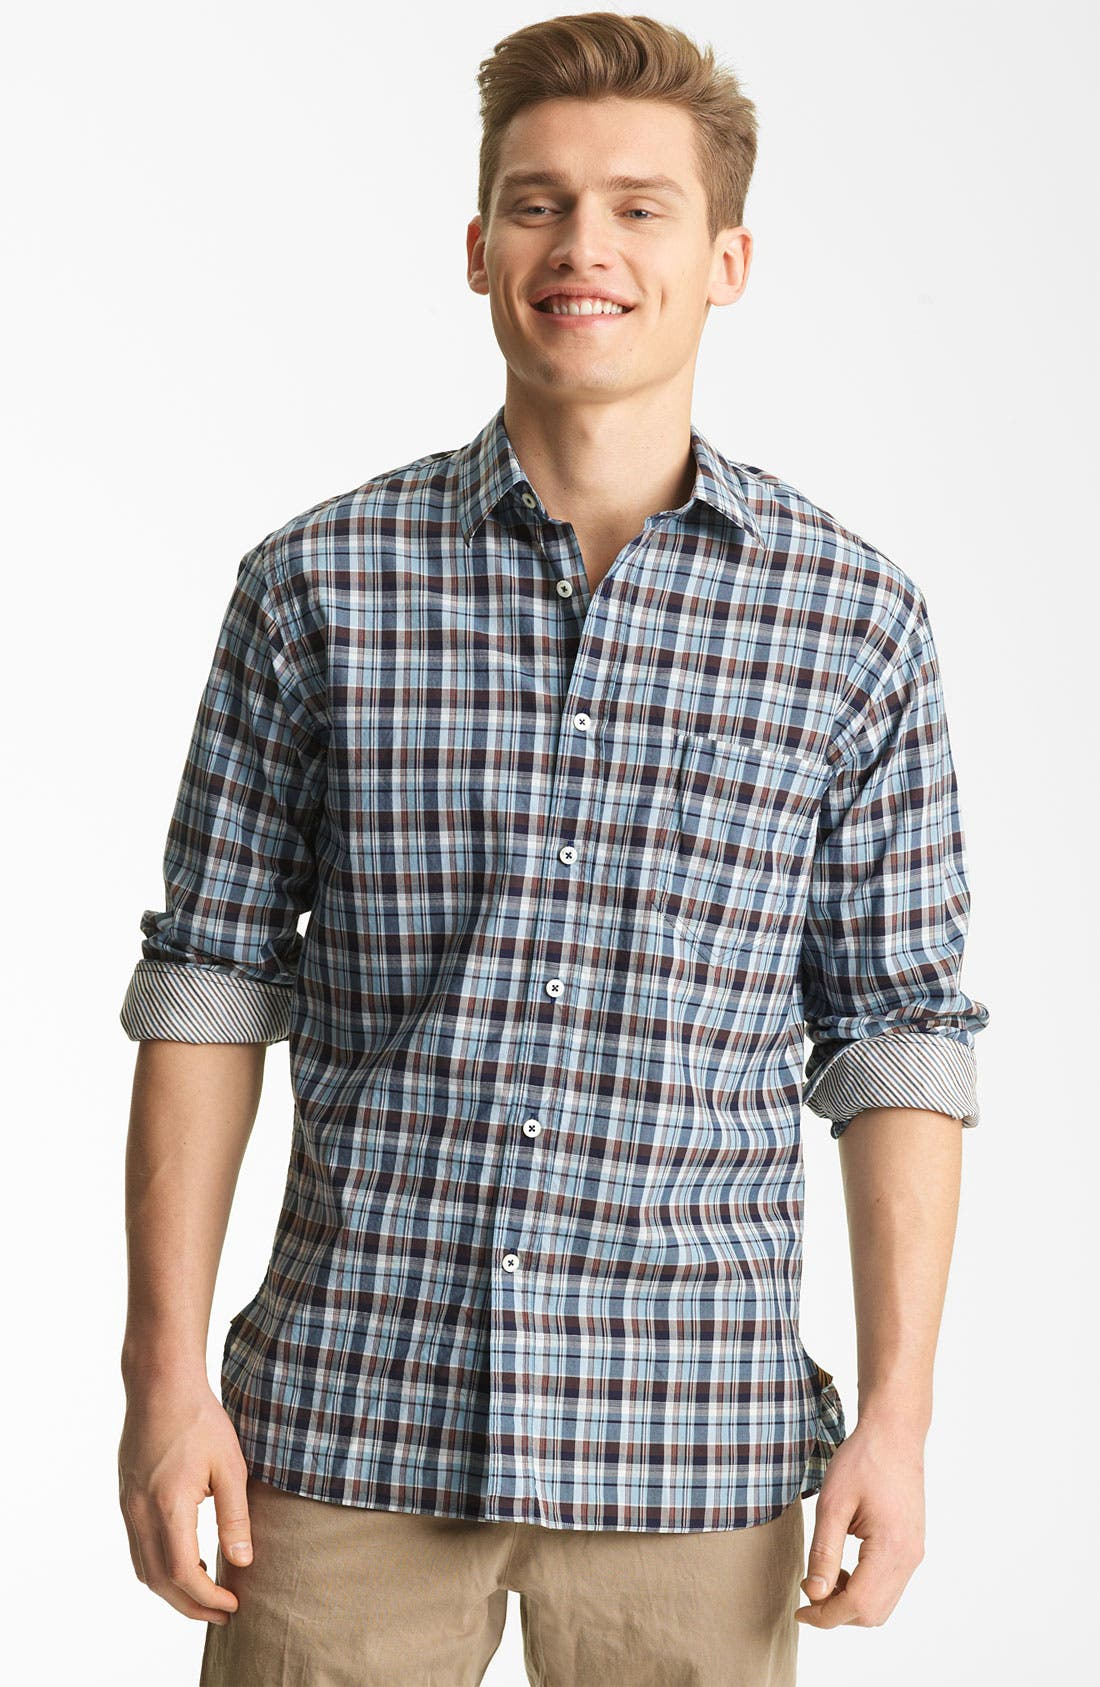 Alternate Image 1 Selected - Billy Reid 'Bagwelt' Plaid Woven Shirt